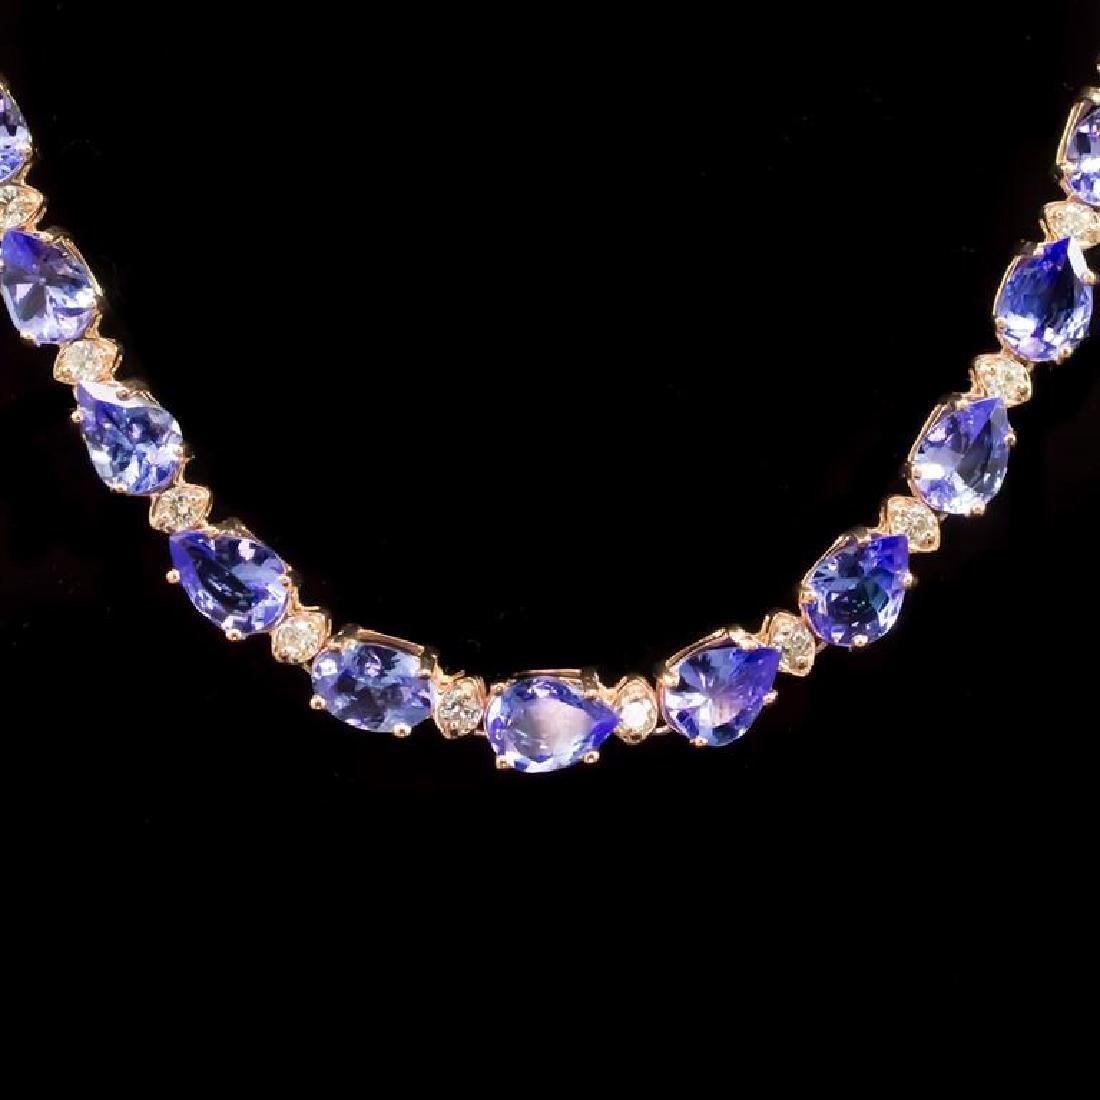 14k Gold 26.35ct Tanzanite 1.82ct Diamond Necklace